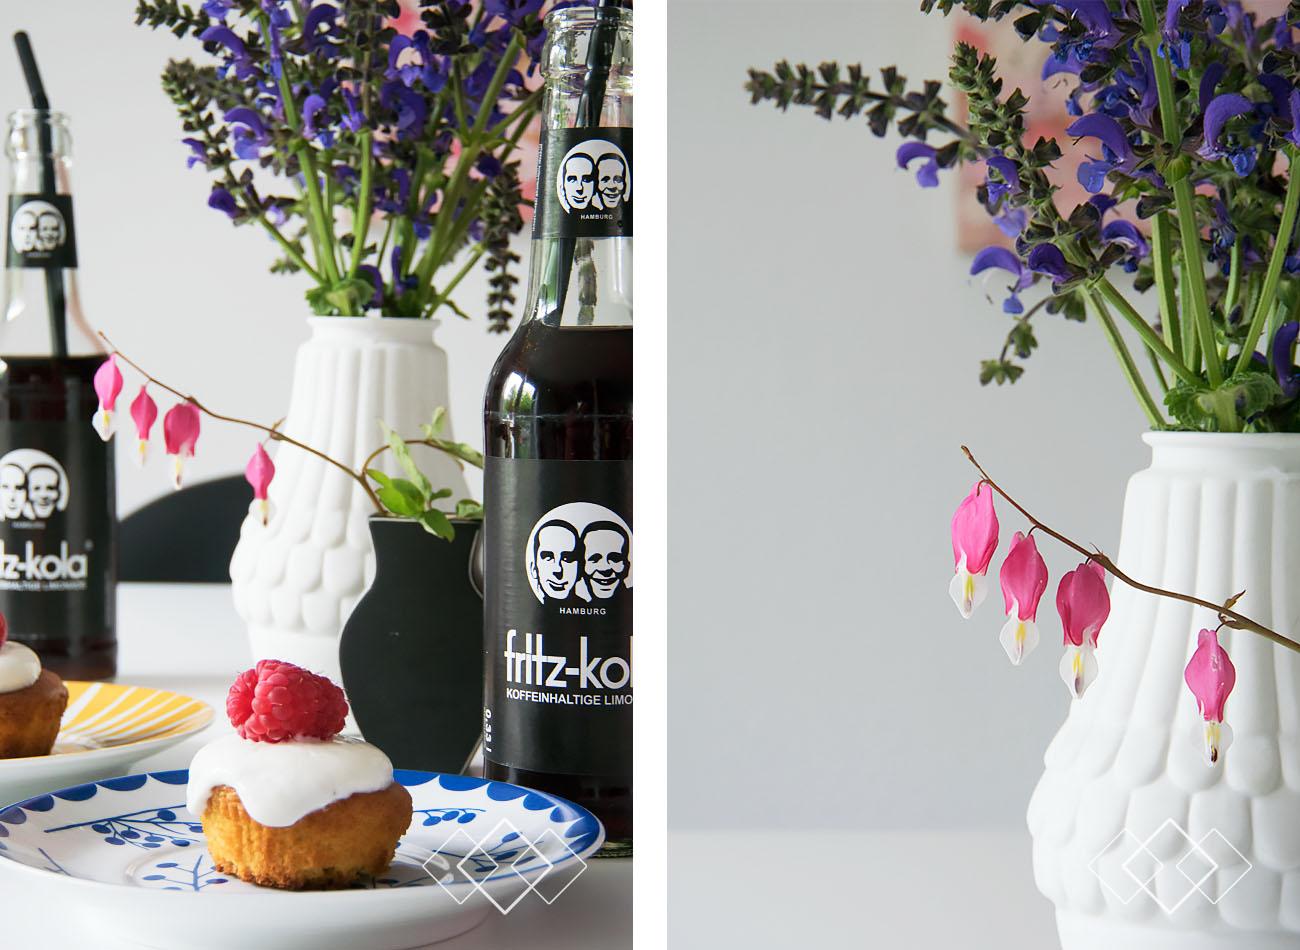 gezonde muffins - staand 1